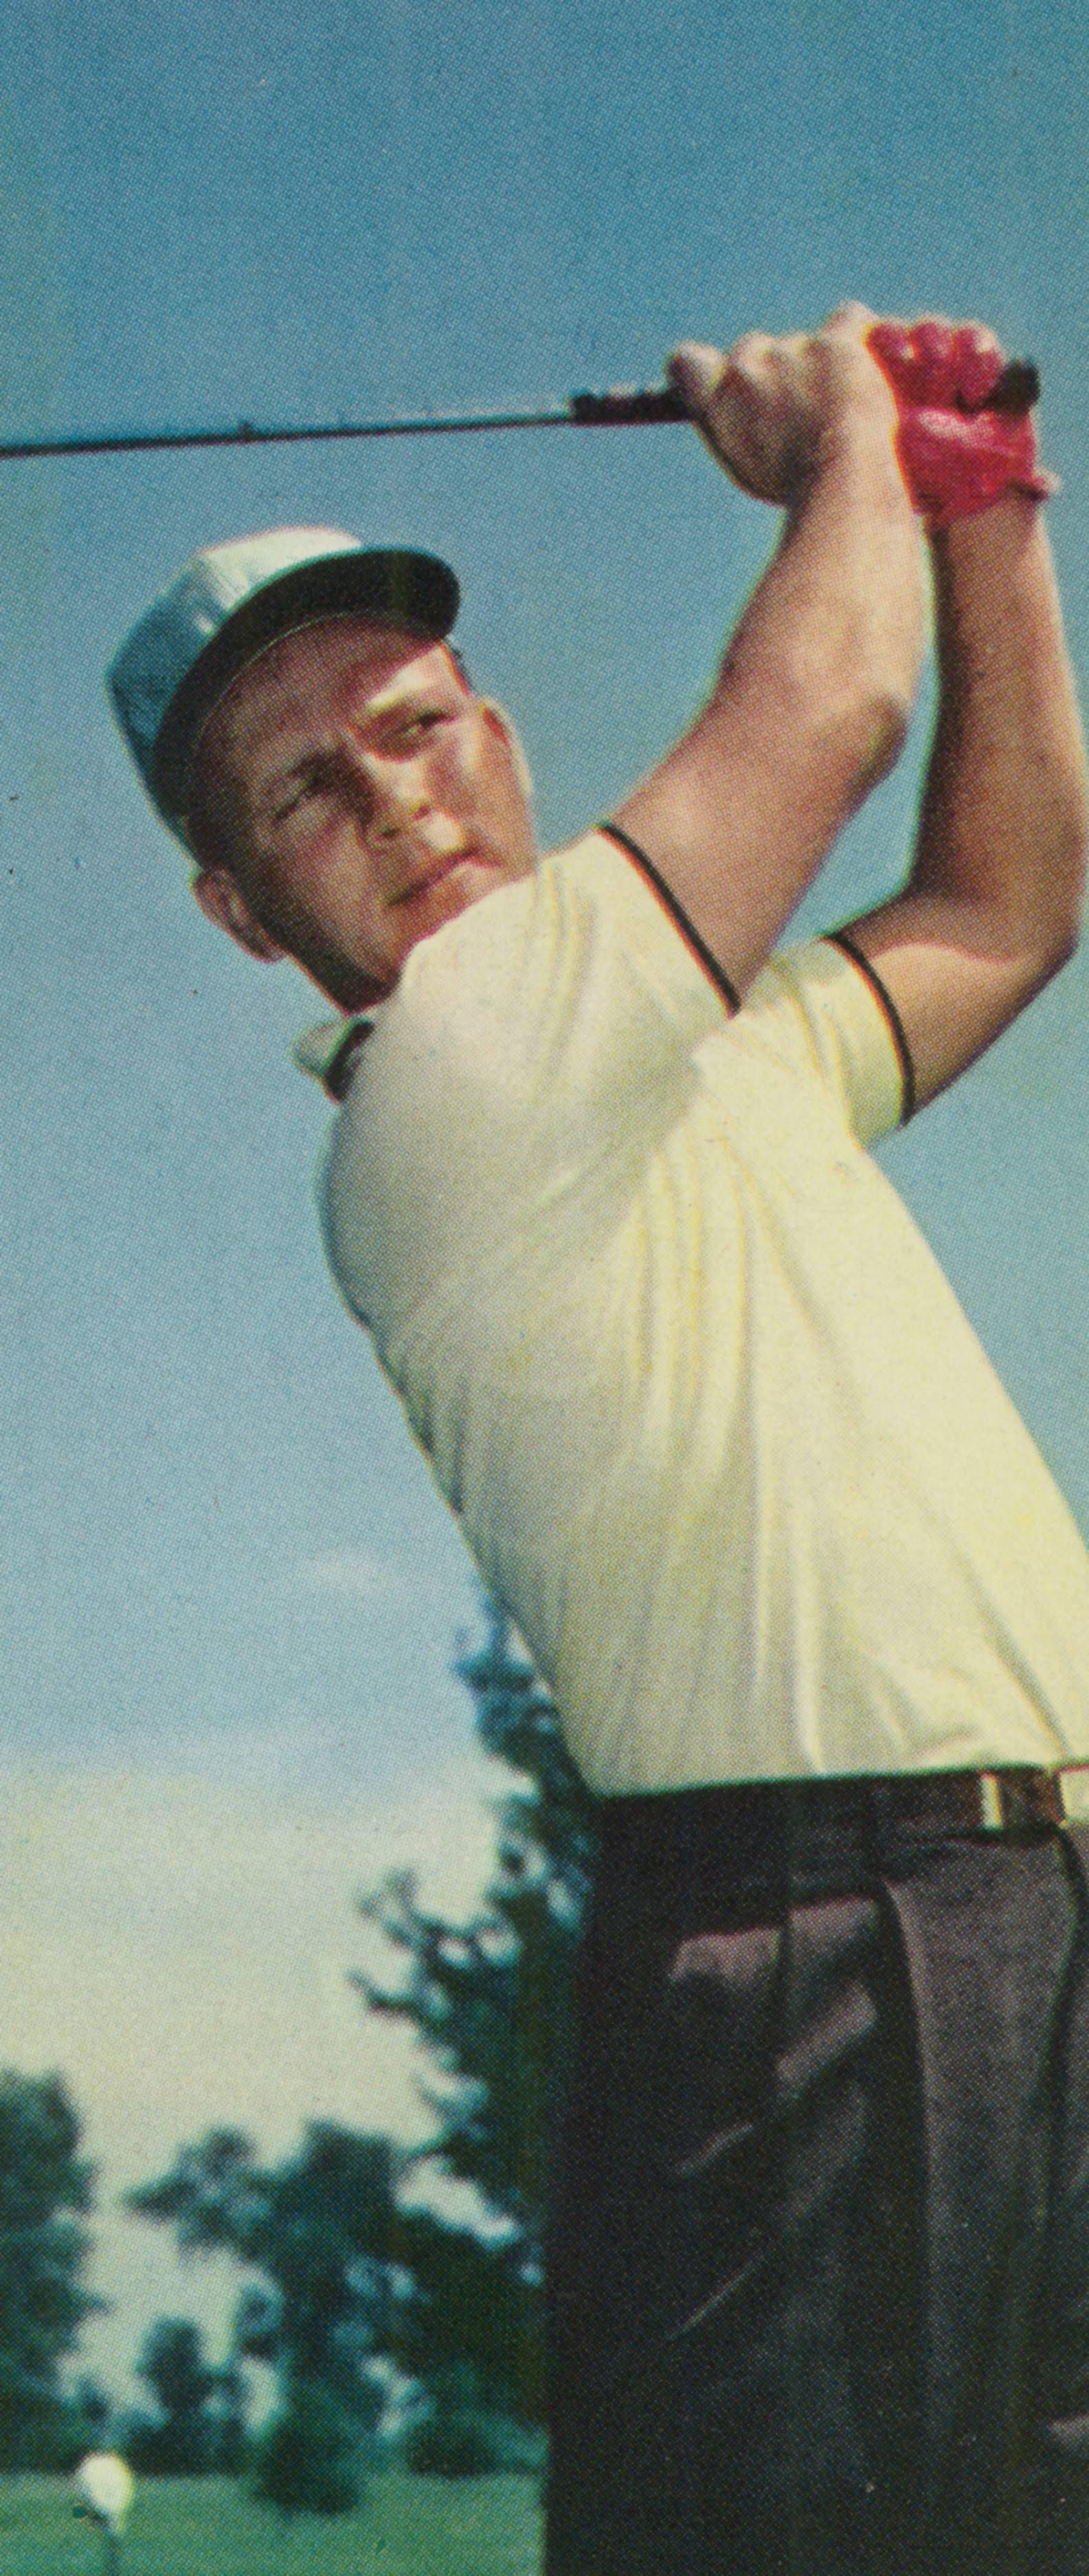 1961_Arnold_Palmer_swinging.jpg